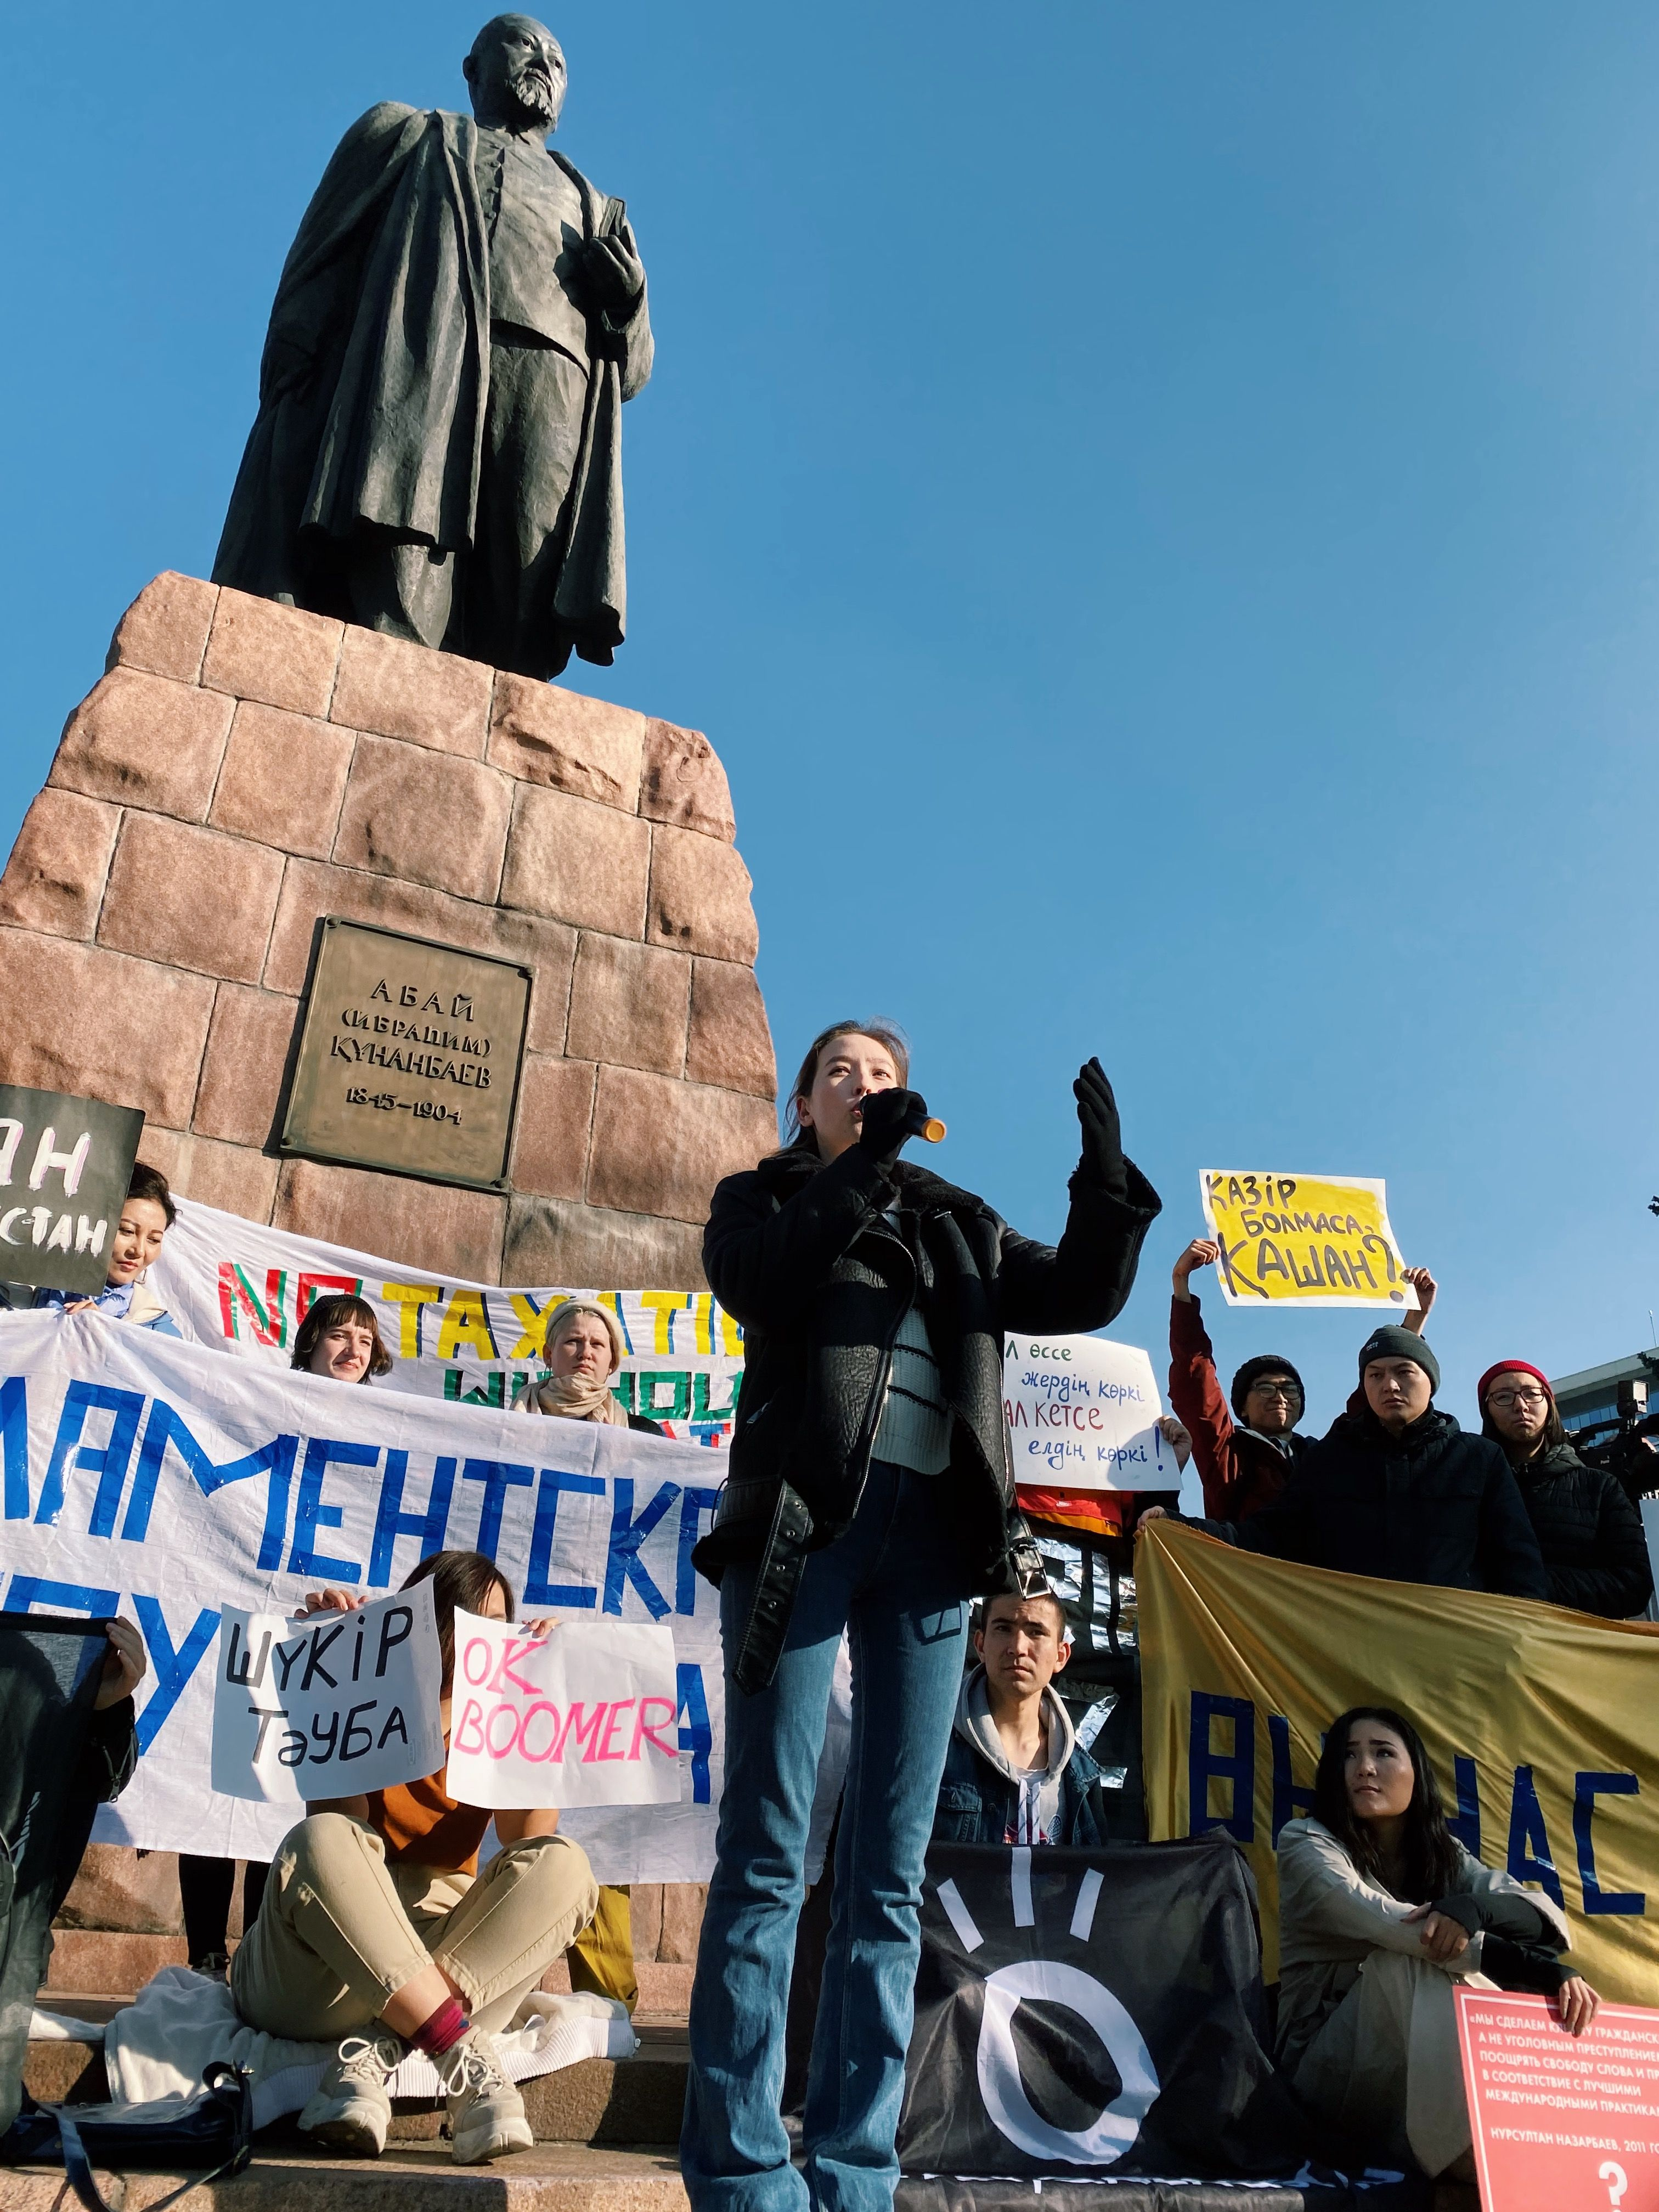 7 Peaceful Protest Ideas Peaceful Protest Protest Political Reform